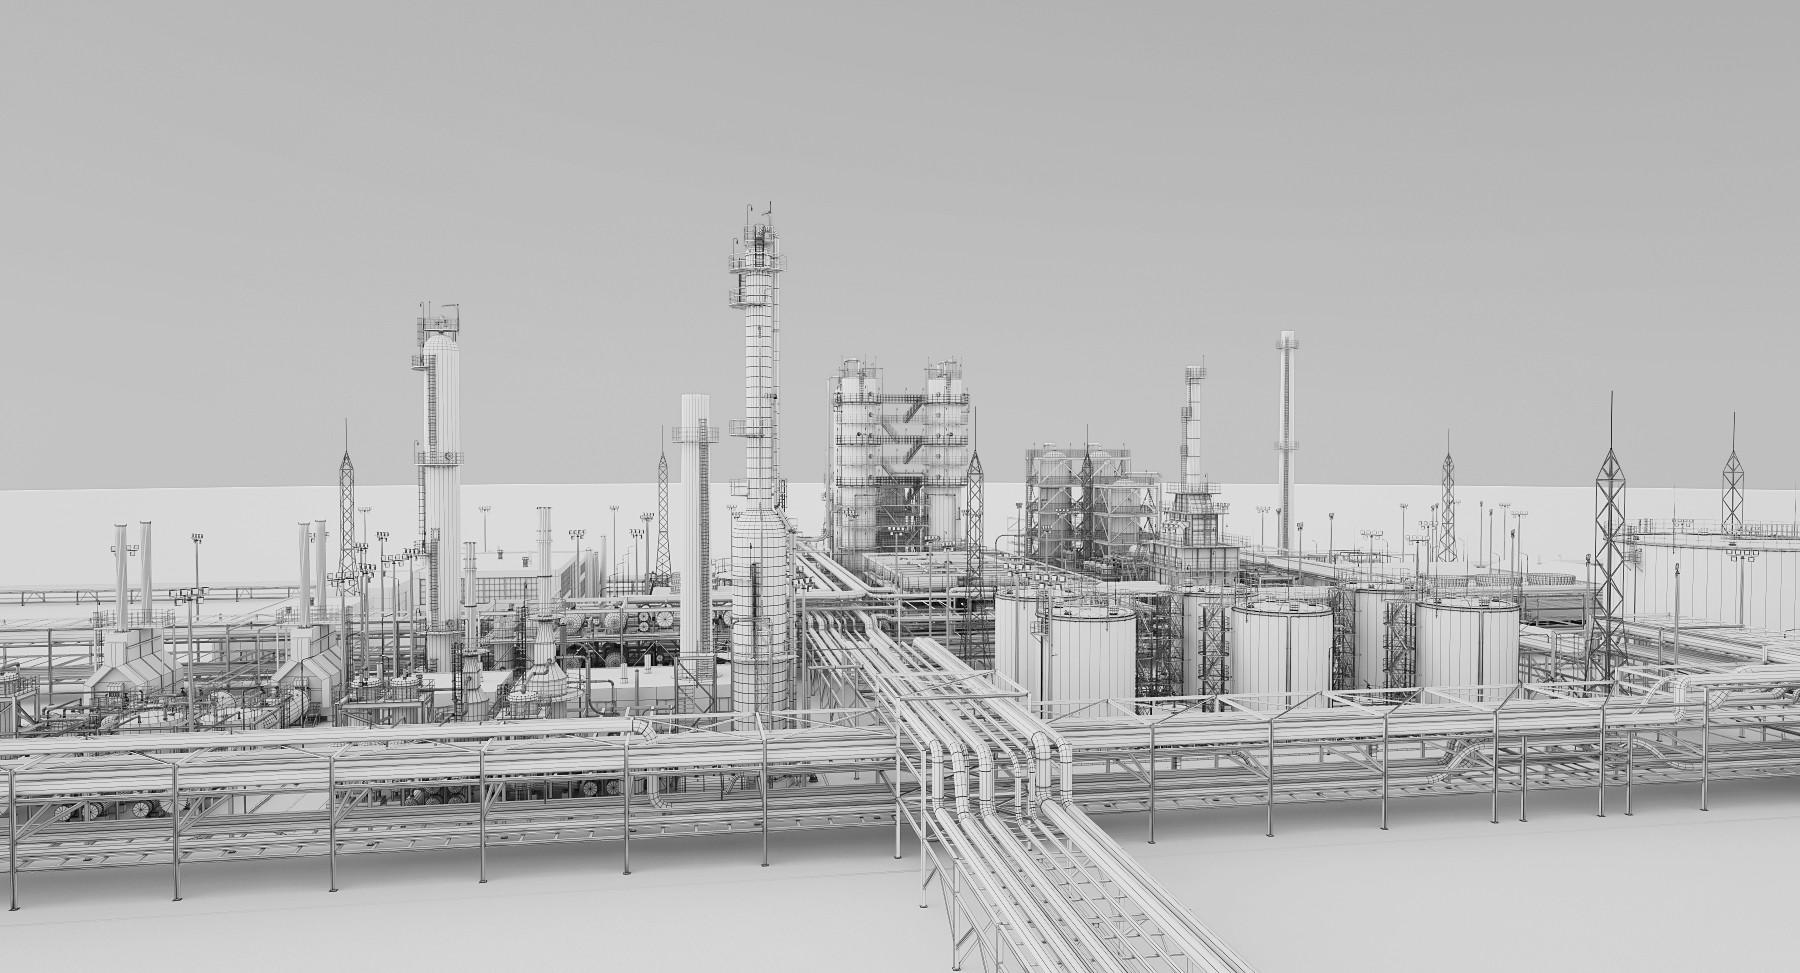 Elvin taghiyev setka refinery